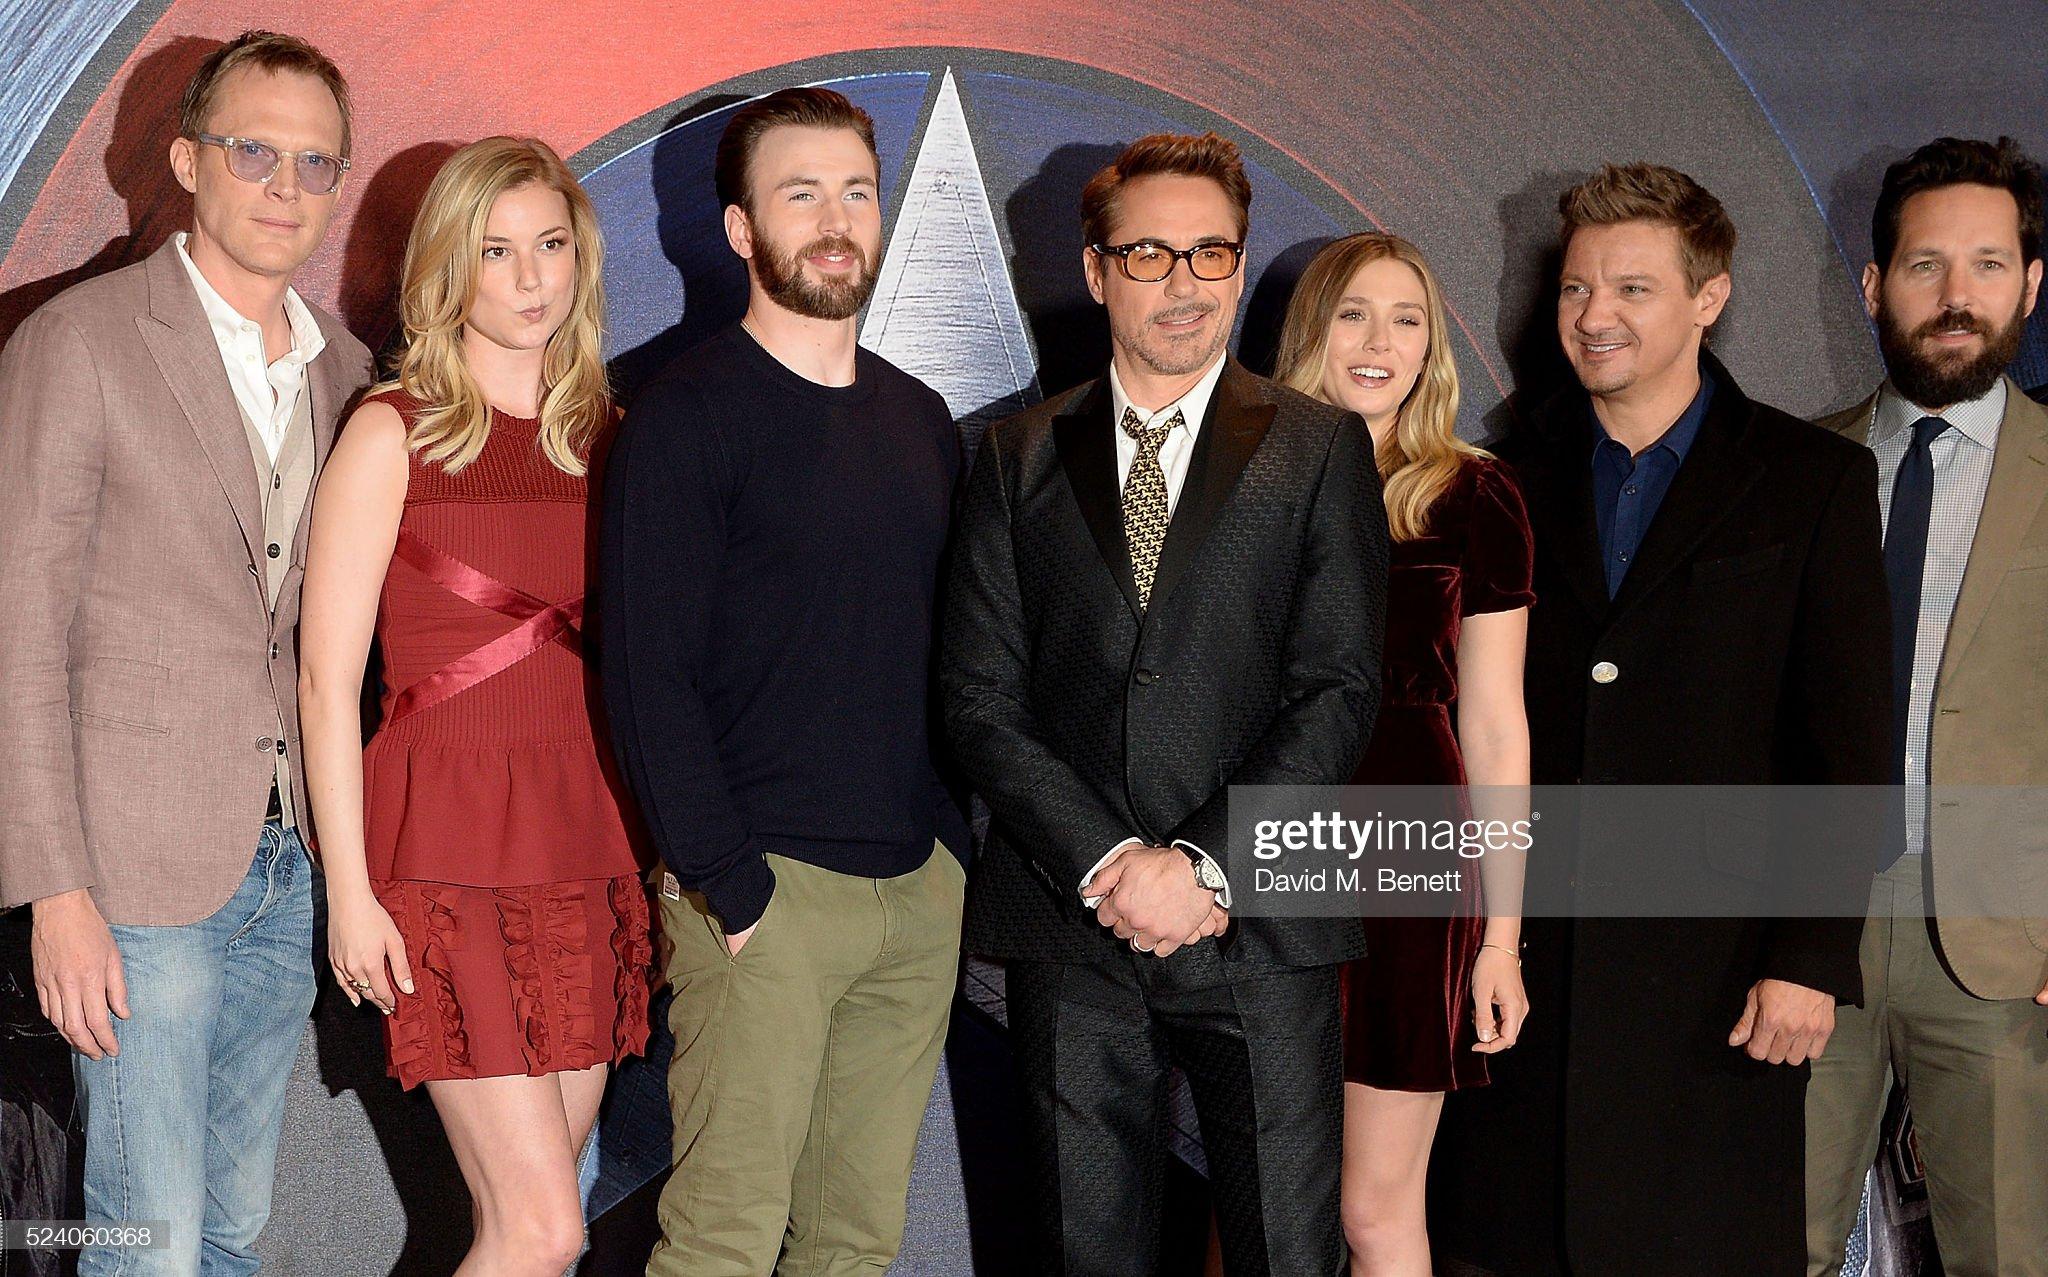 ¿Cuánto mide Robert Downey Jr? - Altura - Real height - Página 5 Paul-bettany-emily-vancamp-chris-evans-robert-downey-jr-elizabeth-picture-id524060368?s=2048x2048